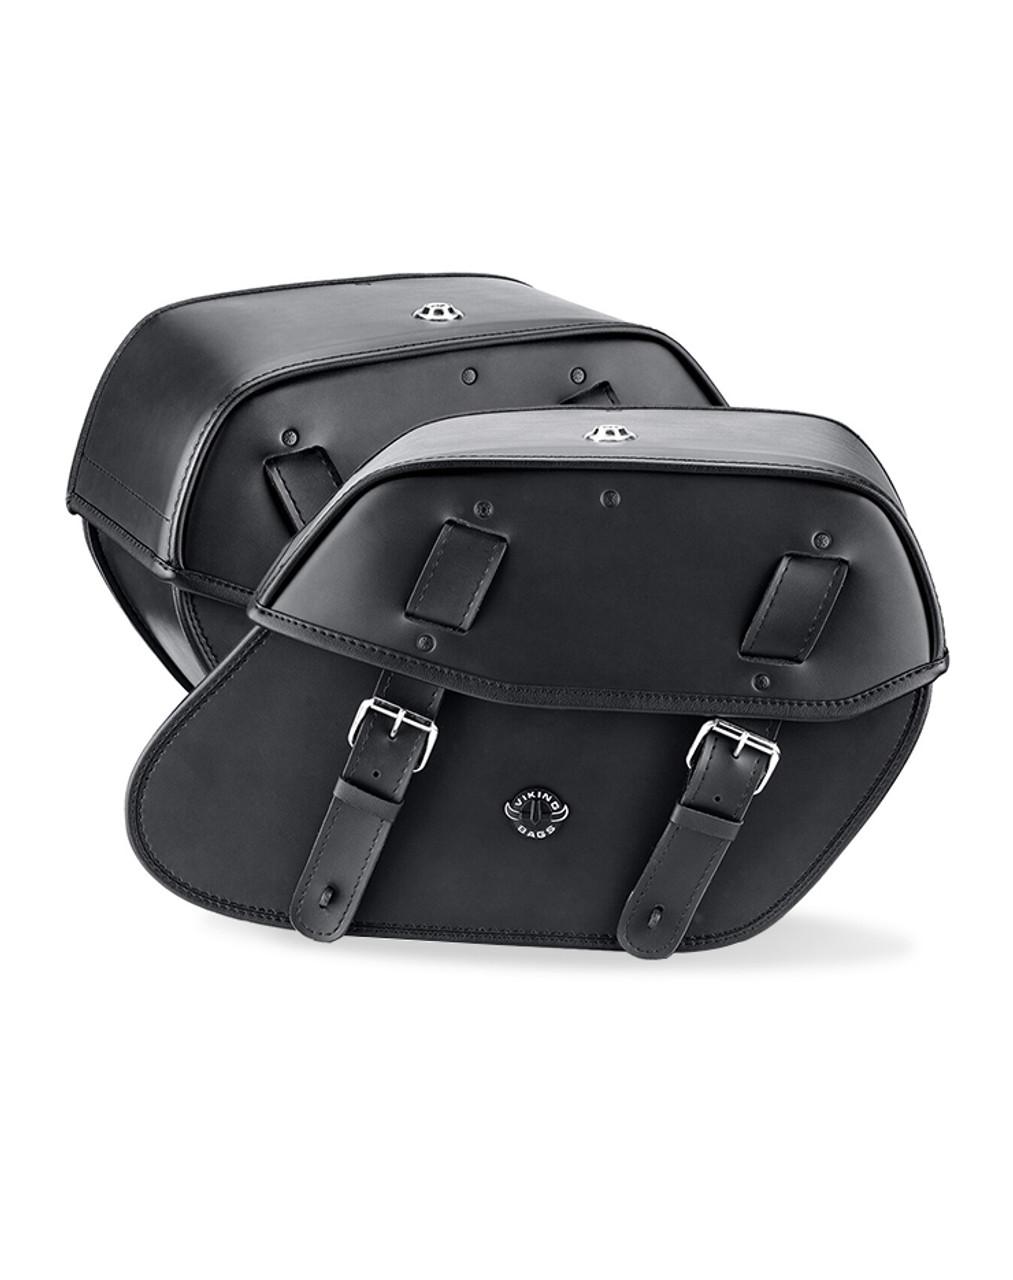 Honda 1500 Valkyrie Interstate Viking Odin Medium Leather Motorcycle Saddlebags Both Bags View